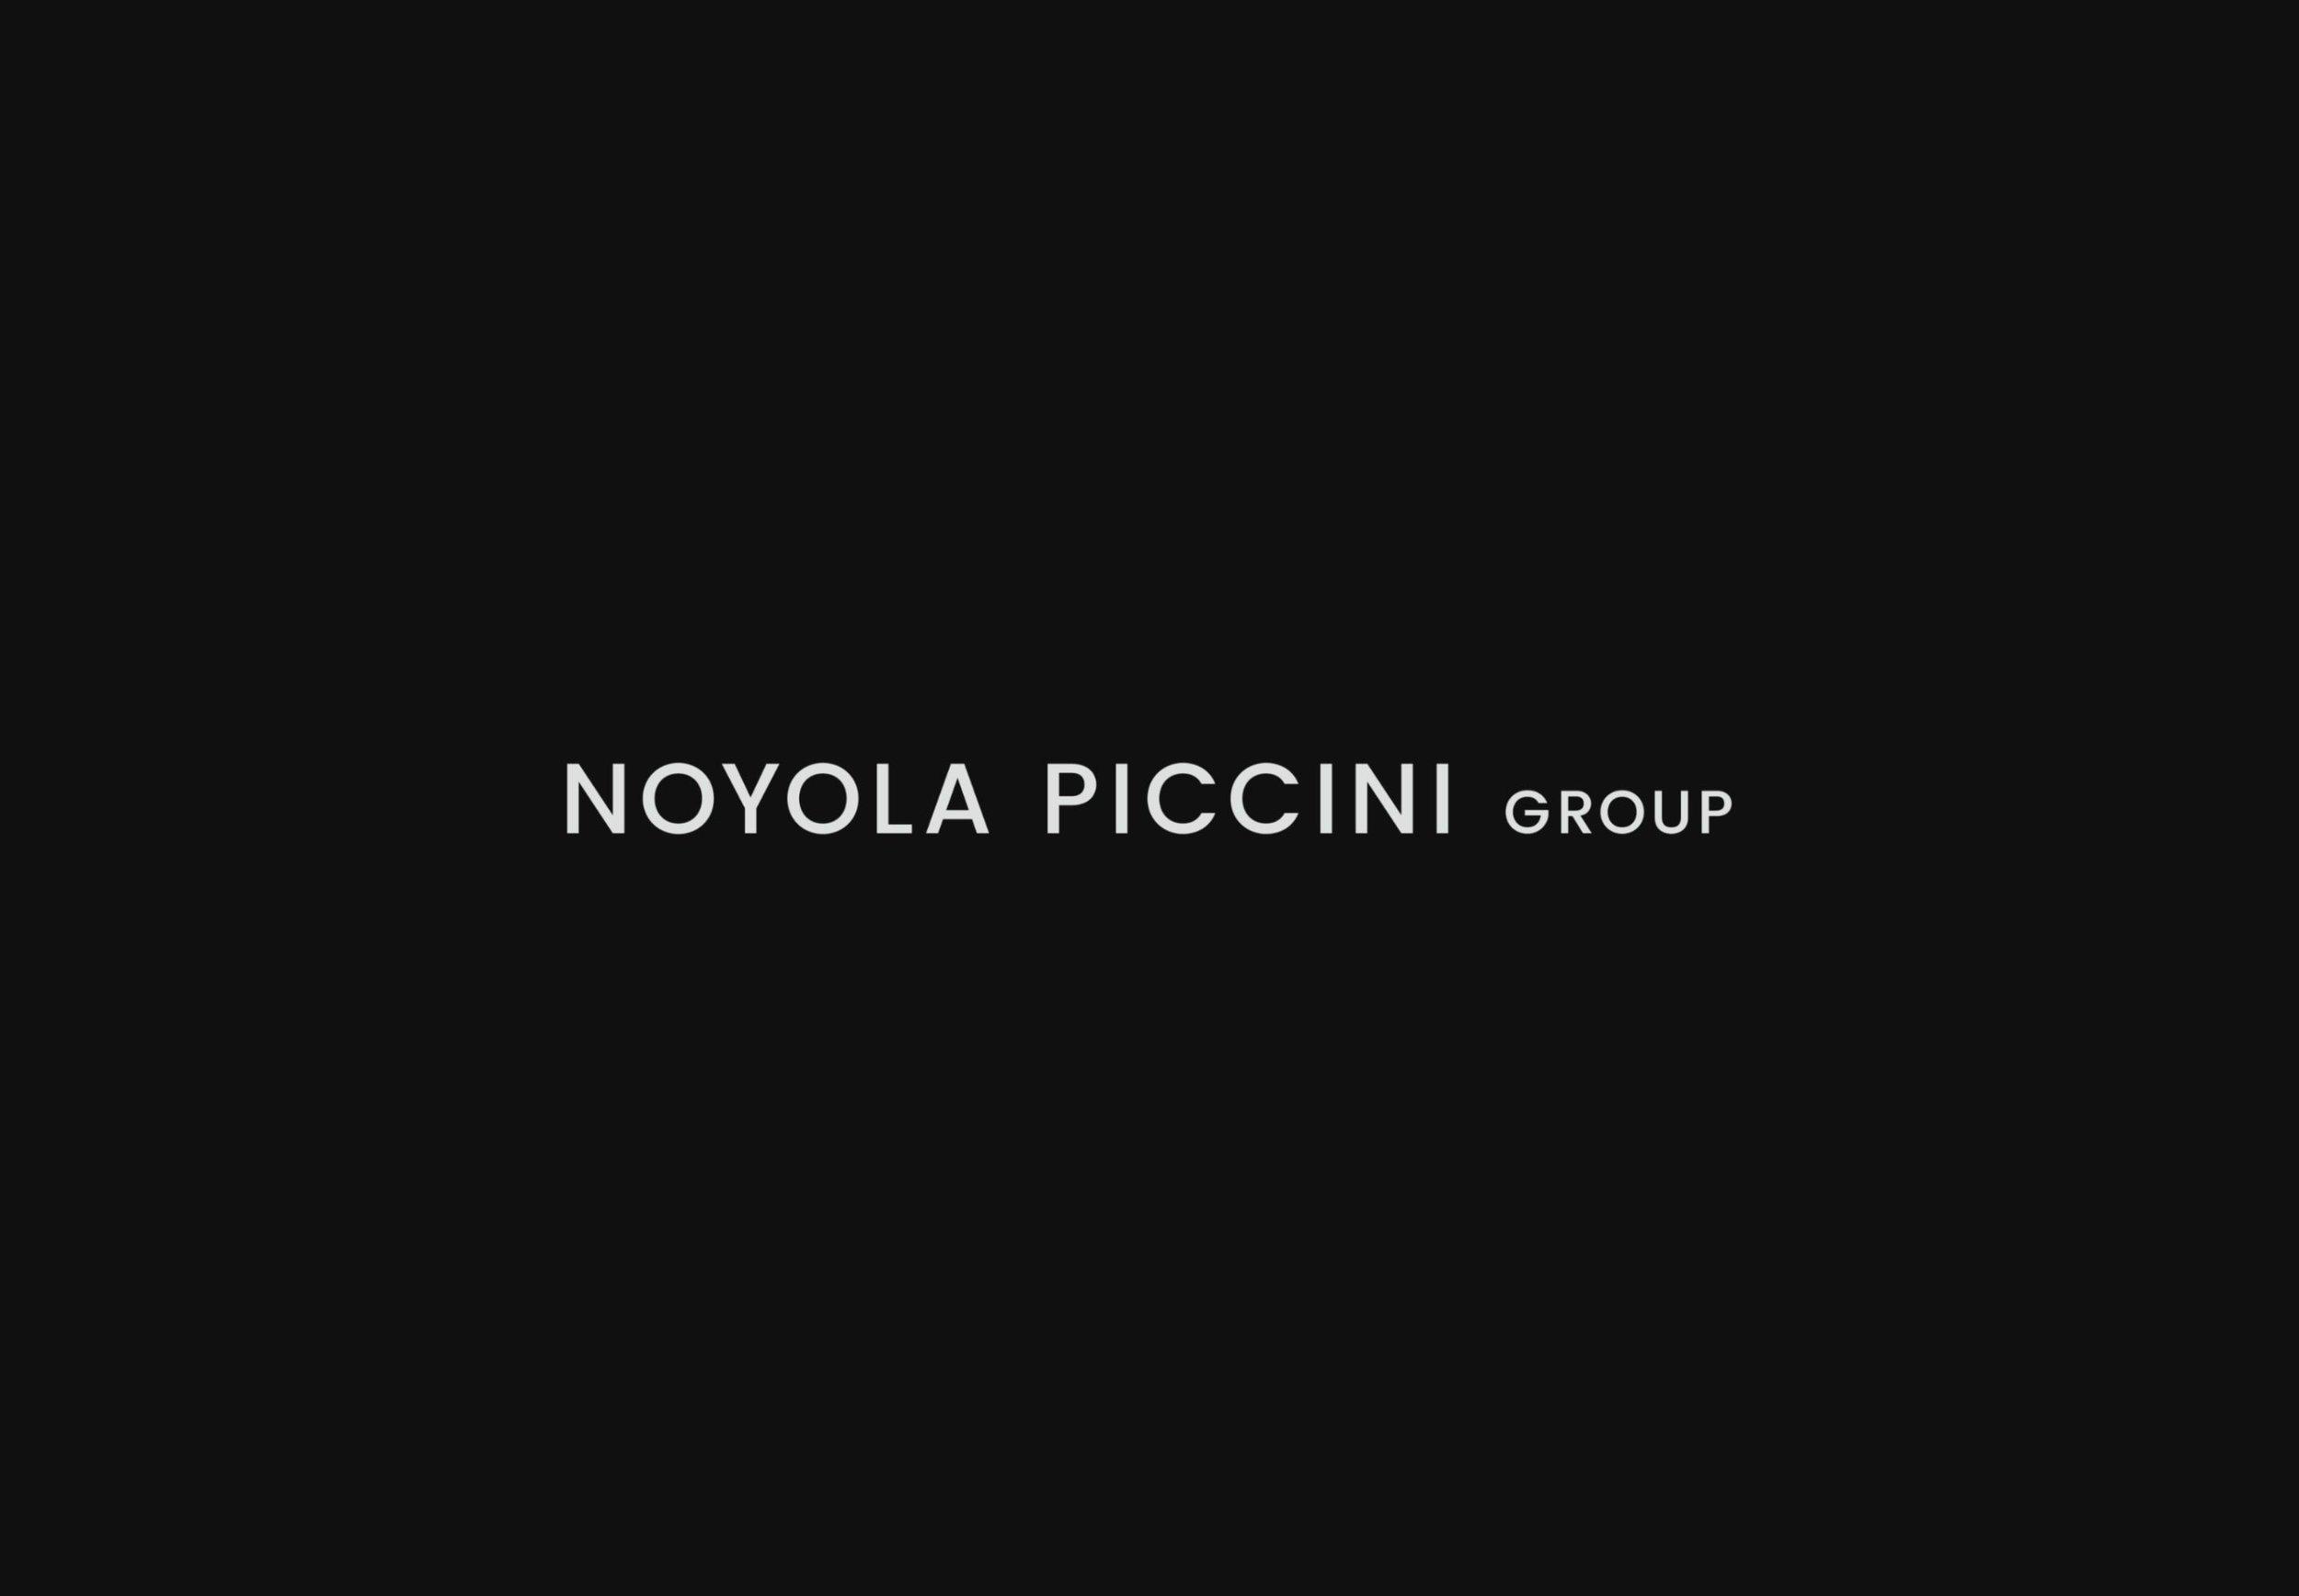 NoyolaPiccini_BradleyHughes_01.jpg